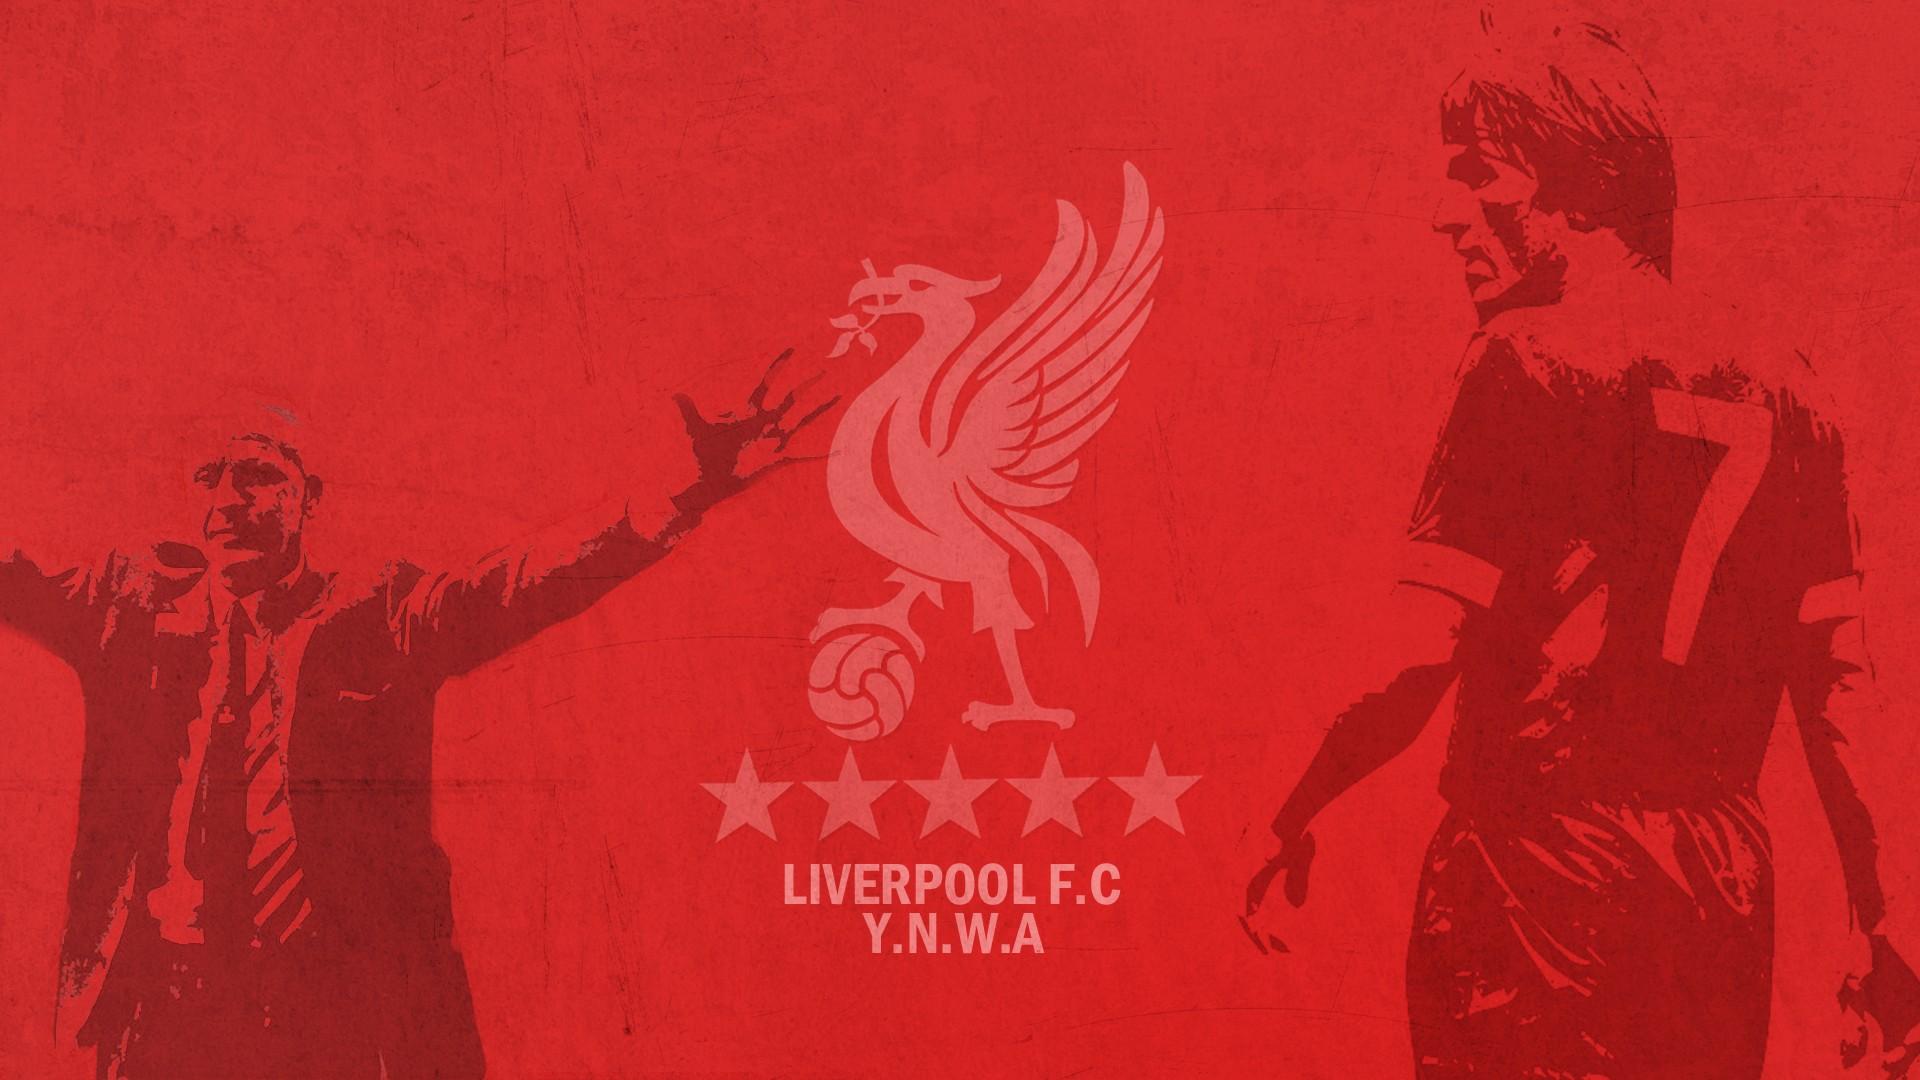 Liverpool Fc Wallpaper Liverpool Background 2019 Hd 1920x1080 Download Hd Wallpaper Wallpapertip